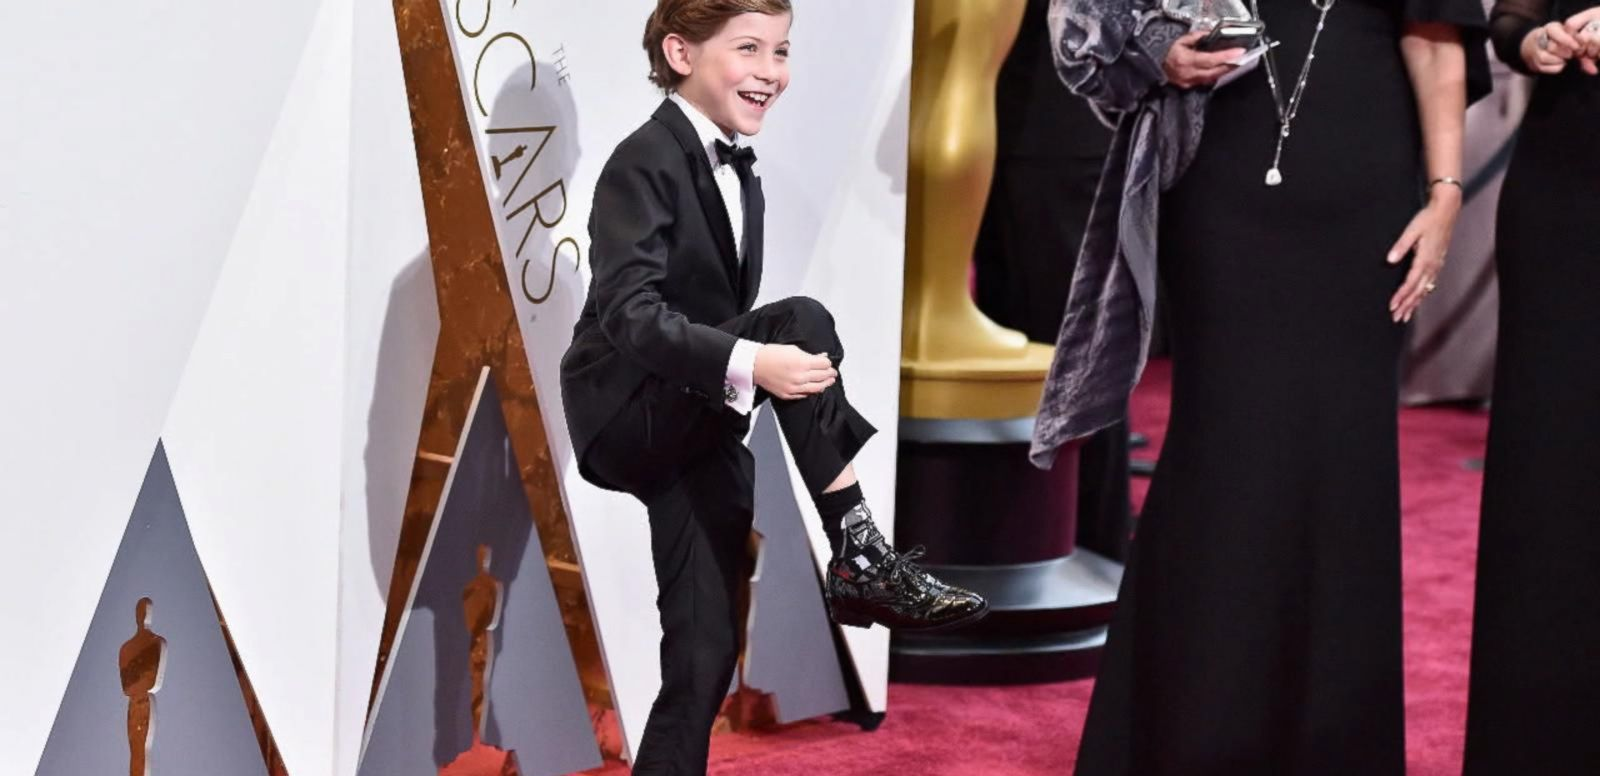 VIDEO: Inside Jacob Tremblays Big Oscar Night